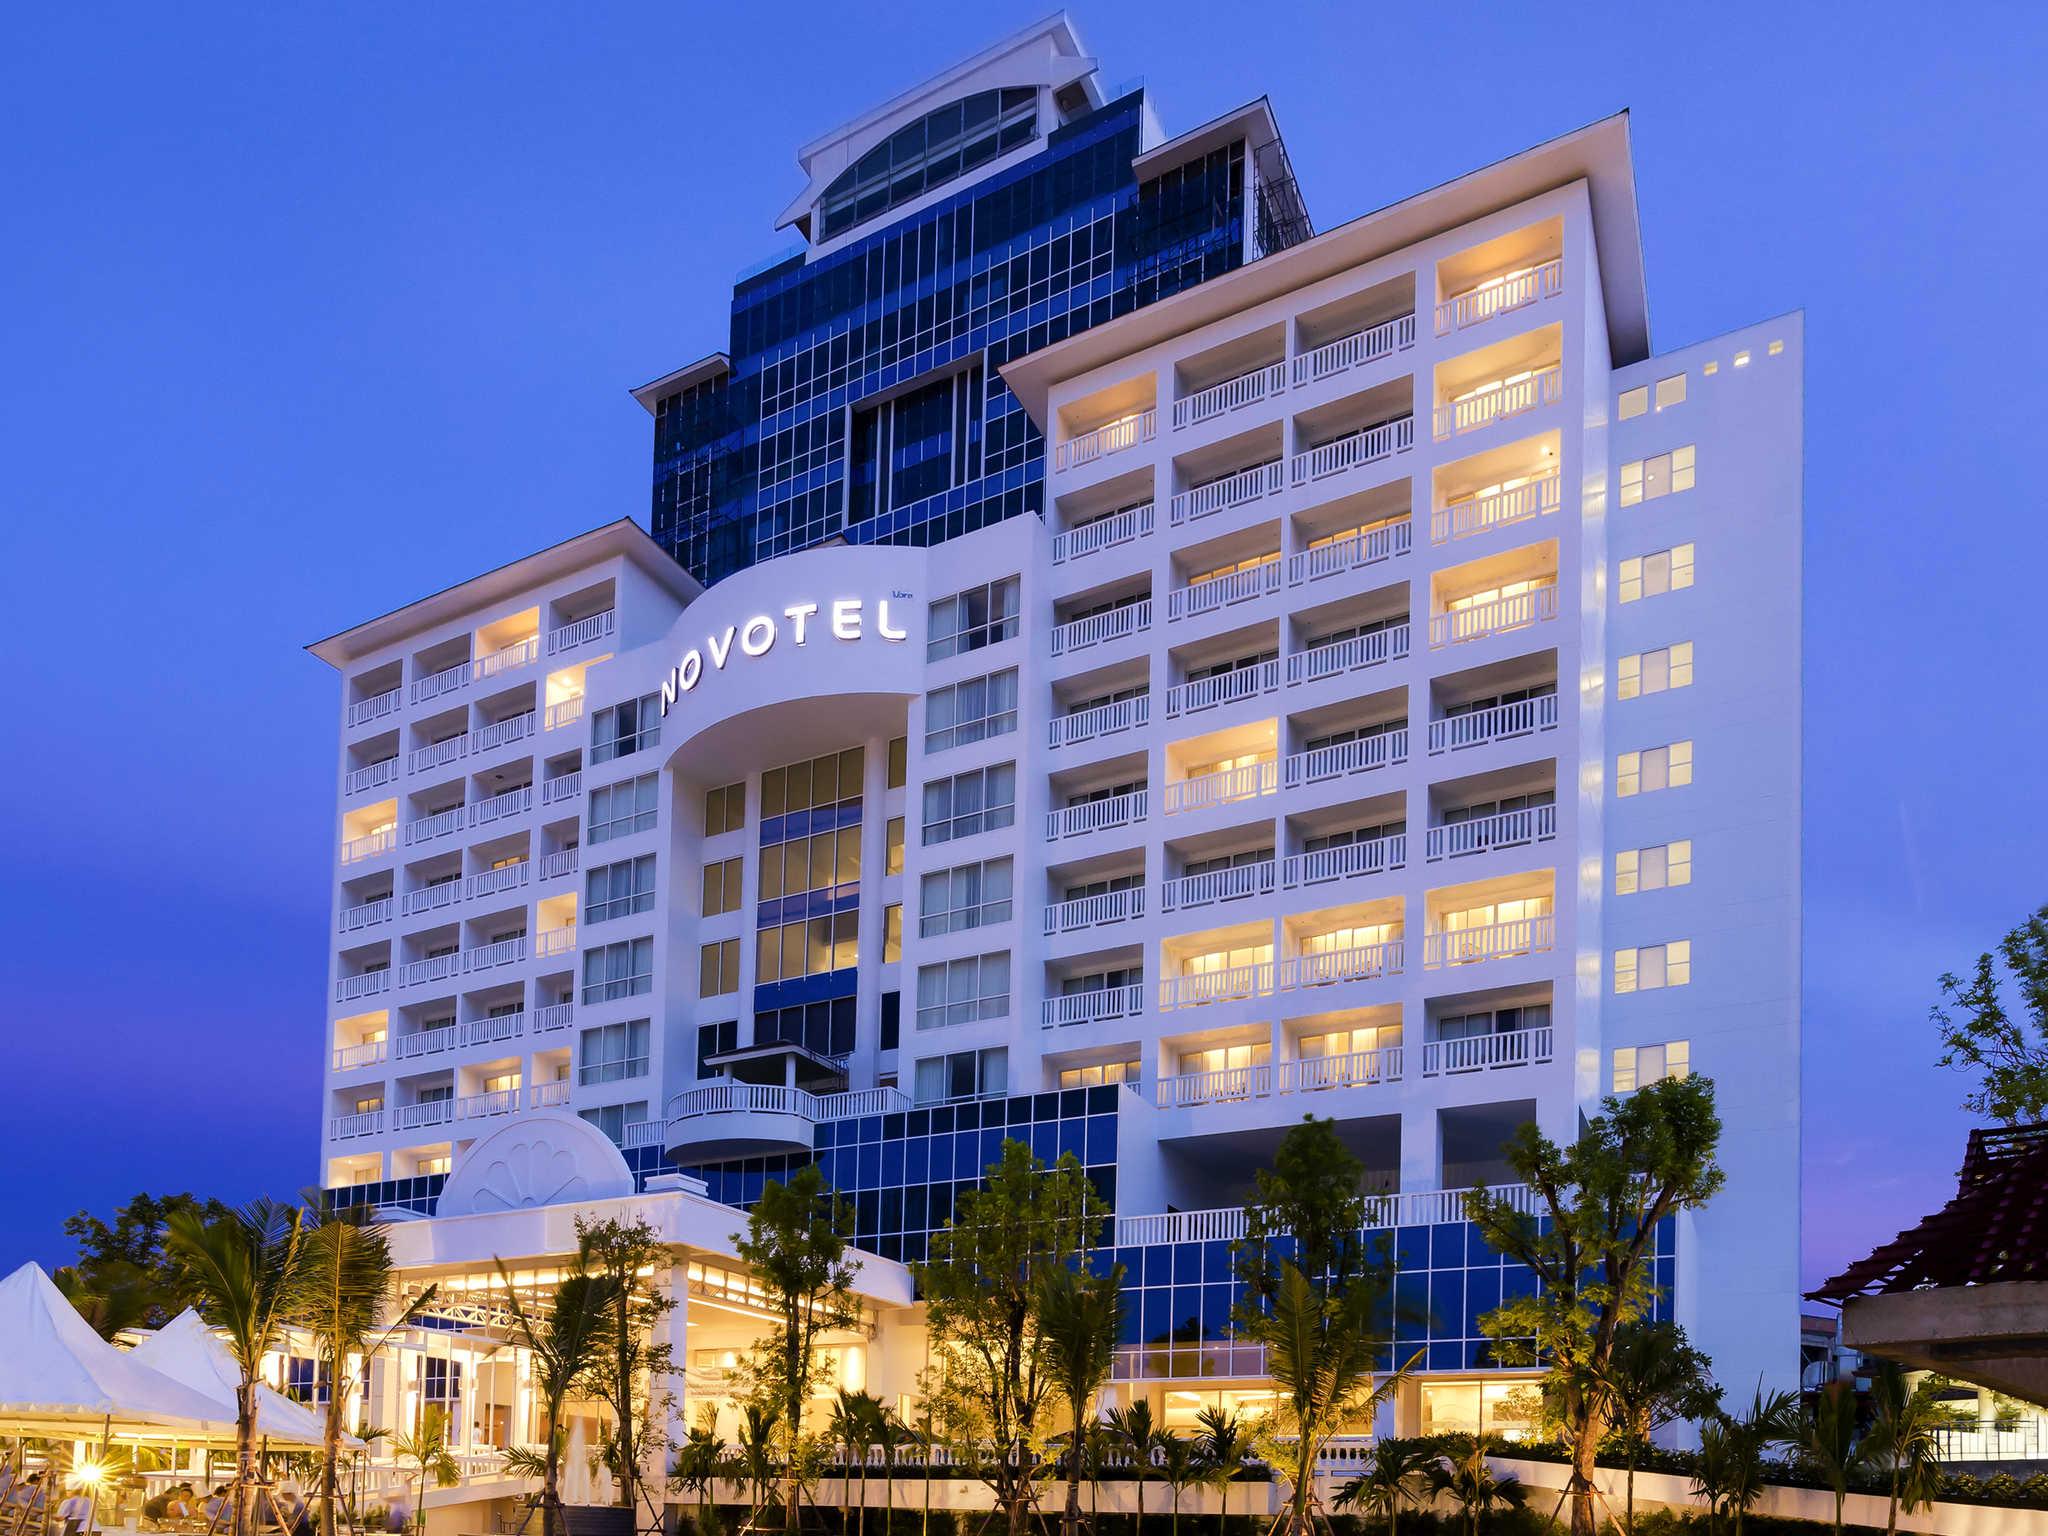 Hotel in Phuket Novotel Phuket Phokeethra